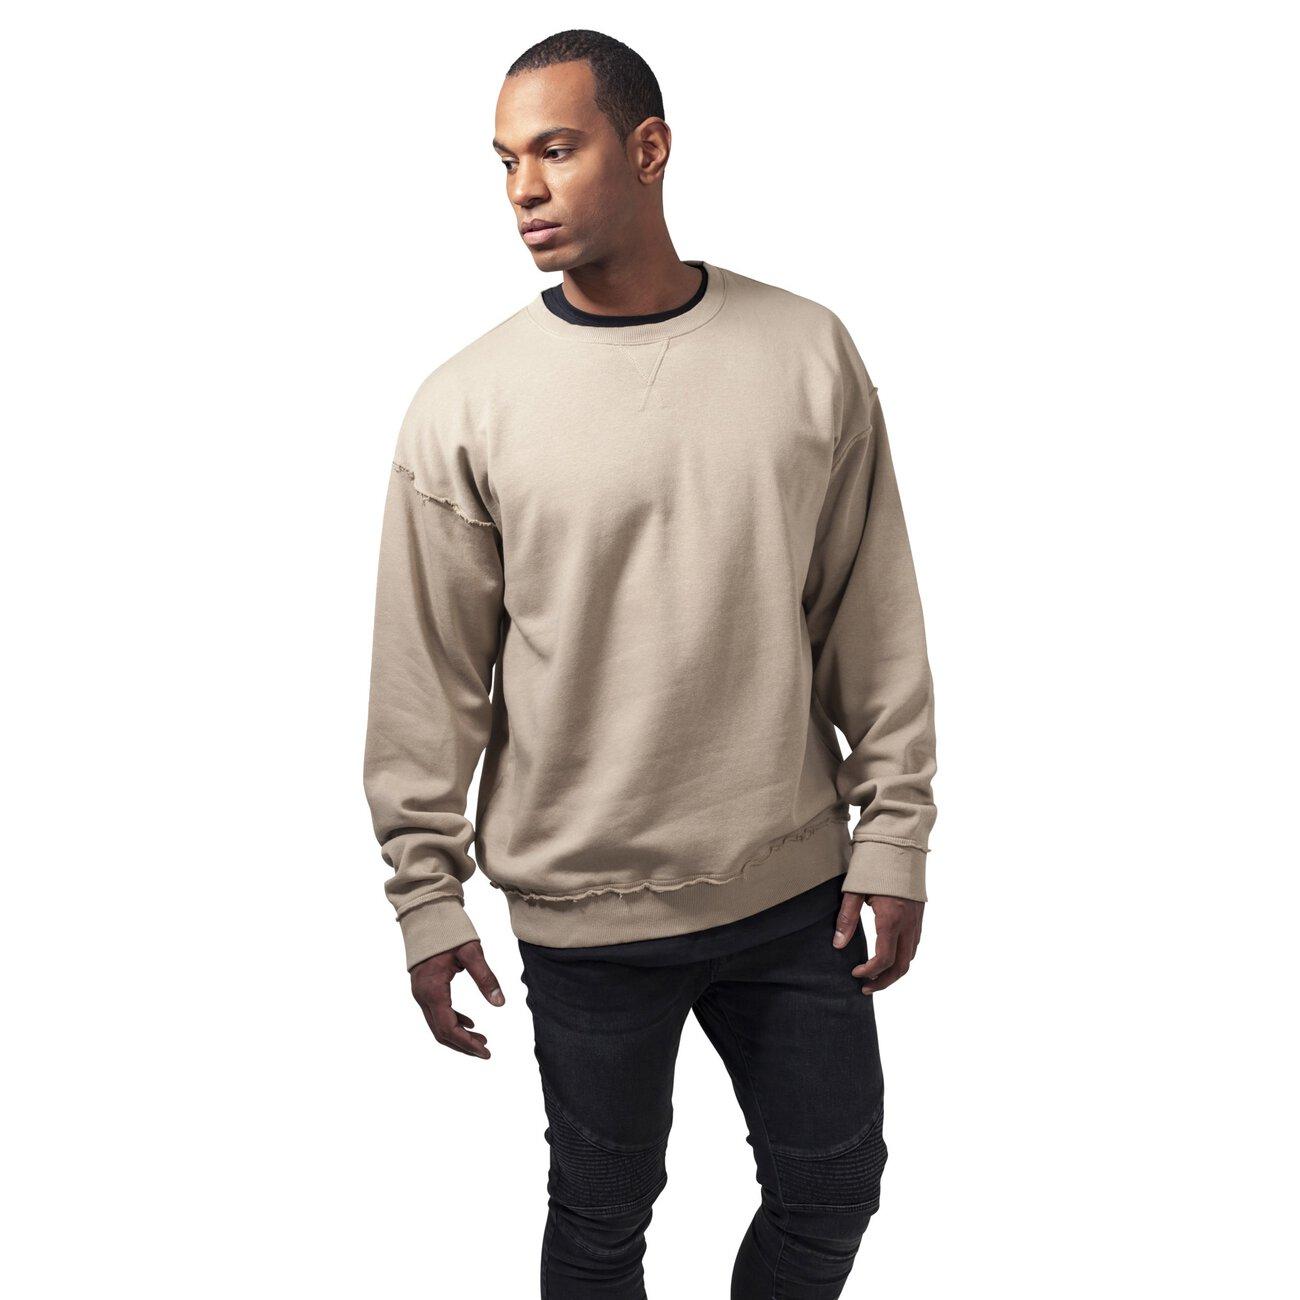 dd01c49fd54ab3 Urban Classics Sweatshirt Herren Oversized Open Edge Crewn Beige